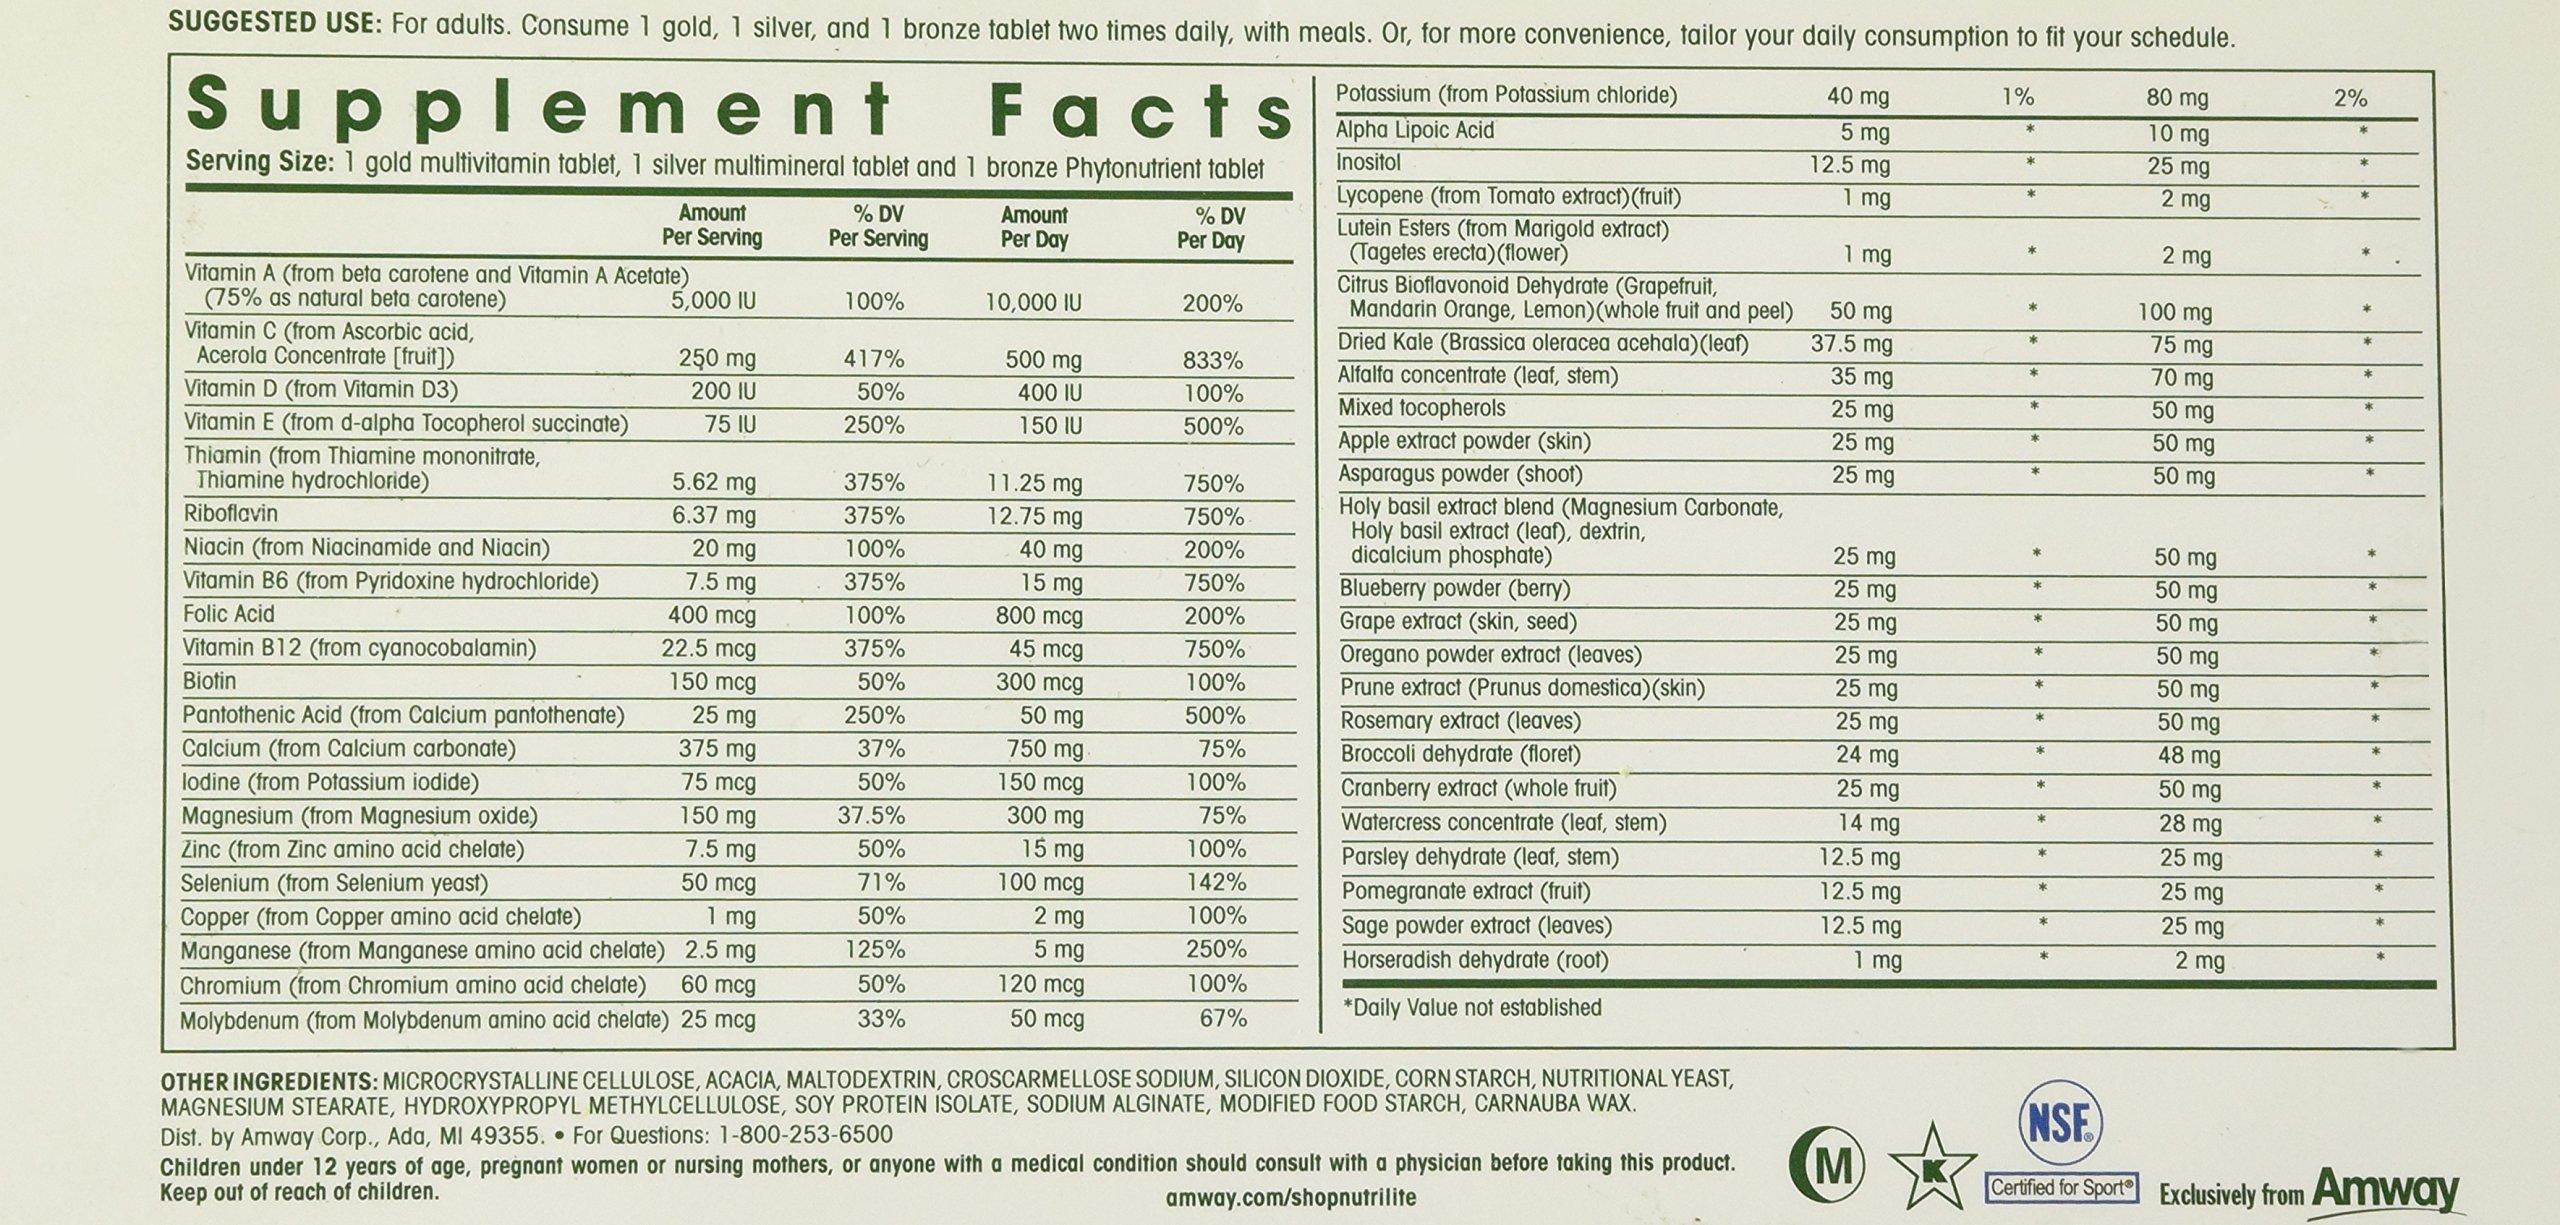 NUTRILITE® DOUBLE X® Vitamin/Mineral/Phytonutrient - 31-day Supply Refill